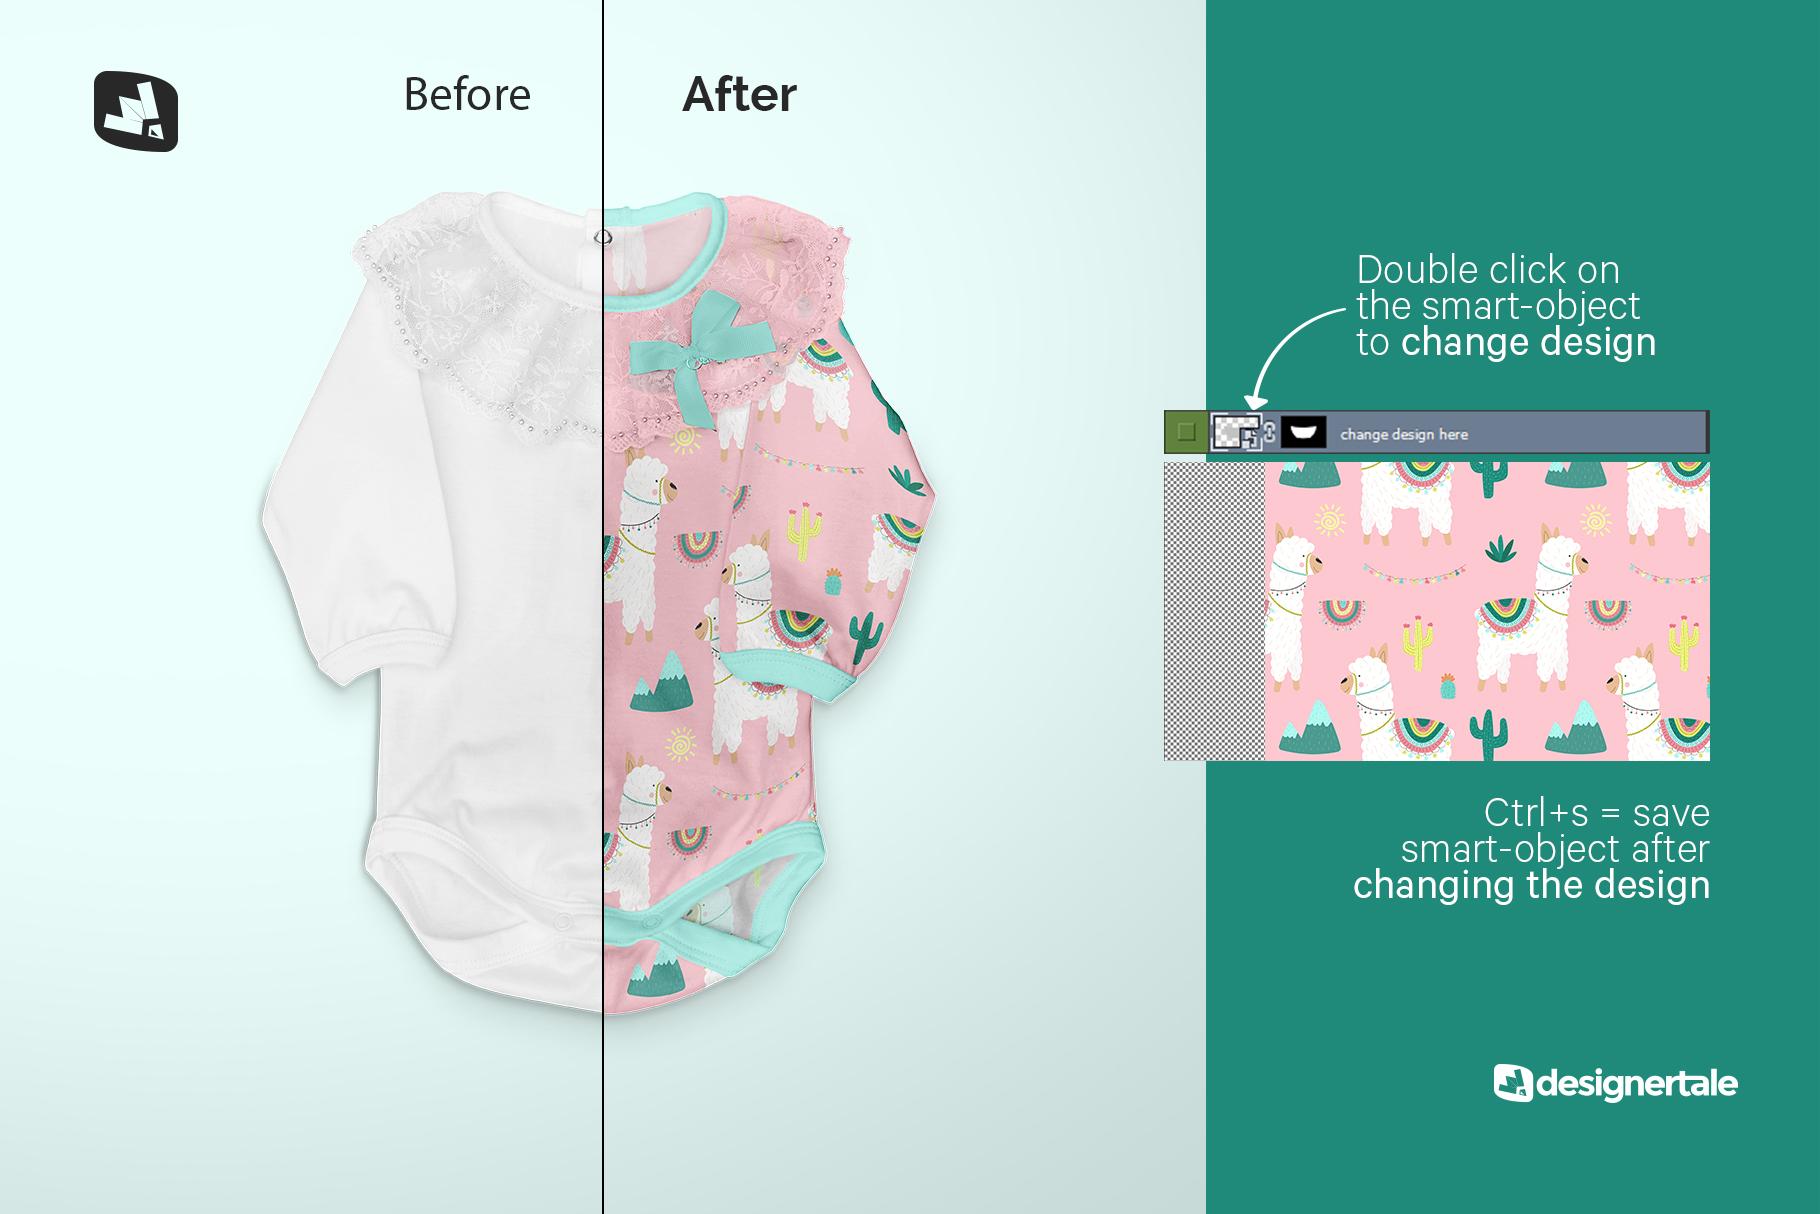 how to change design of the baby girl's onesie mockup